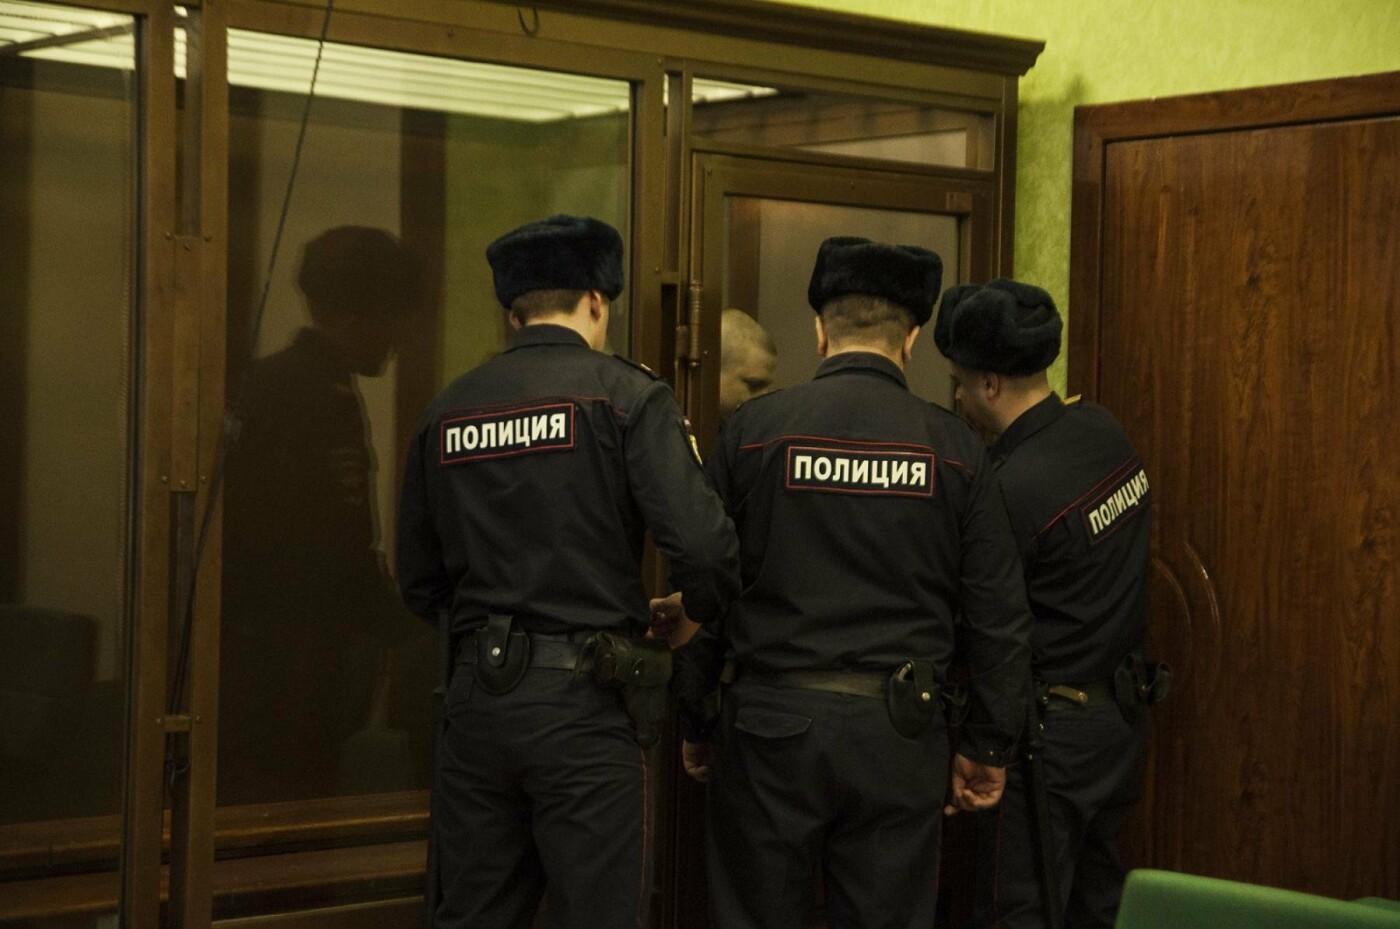 Михаила Саплинова уводят из зала суда - Фото Марии Литвиновой